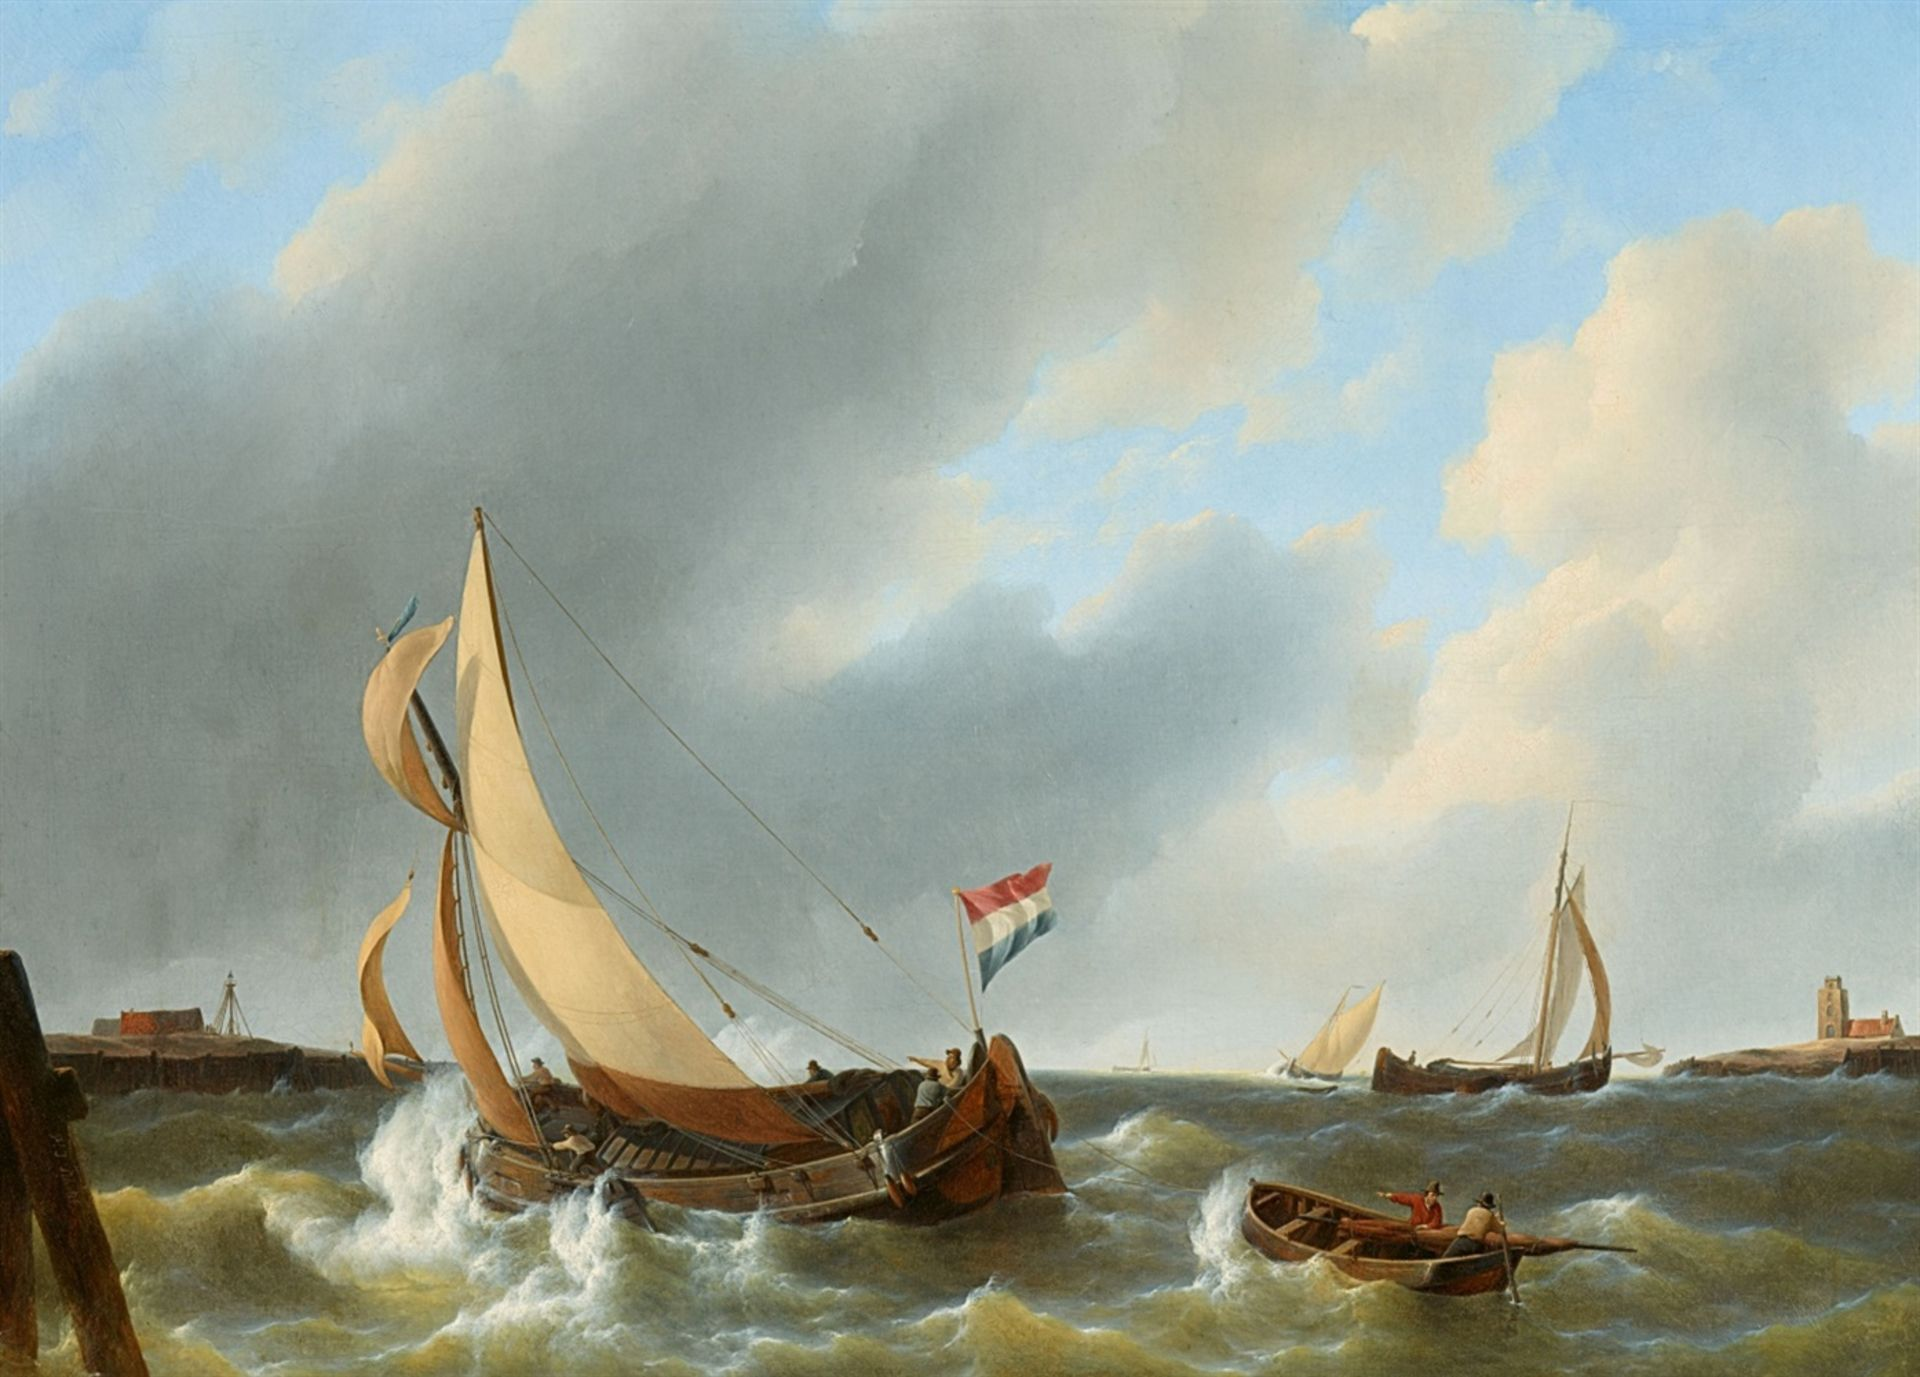 Los 2523 - Petrus Johannes SchotelFishermen Returning in Rough SeasOil on canvas (relined). 77 x 101 cm.